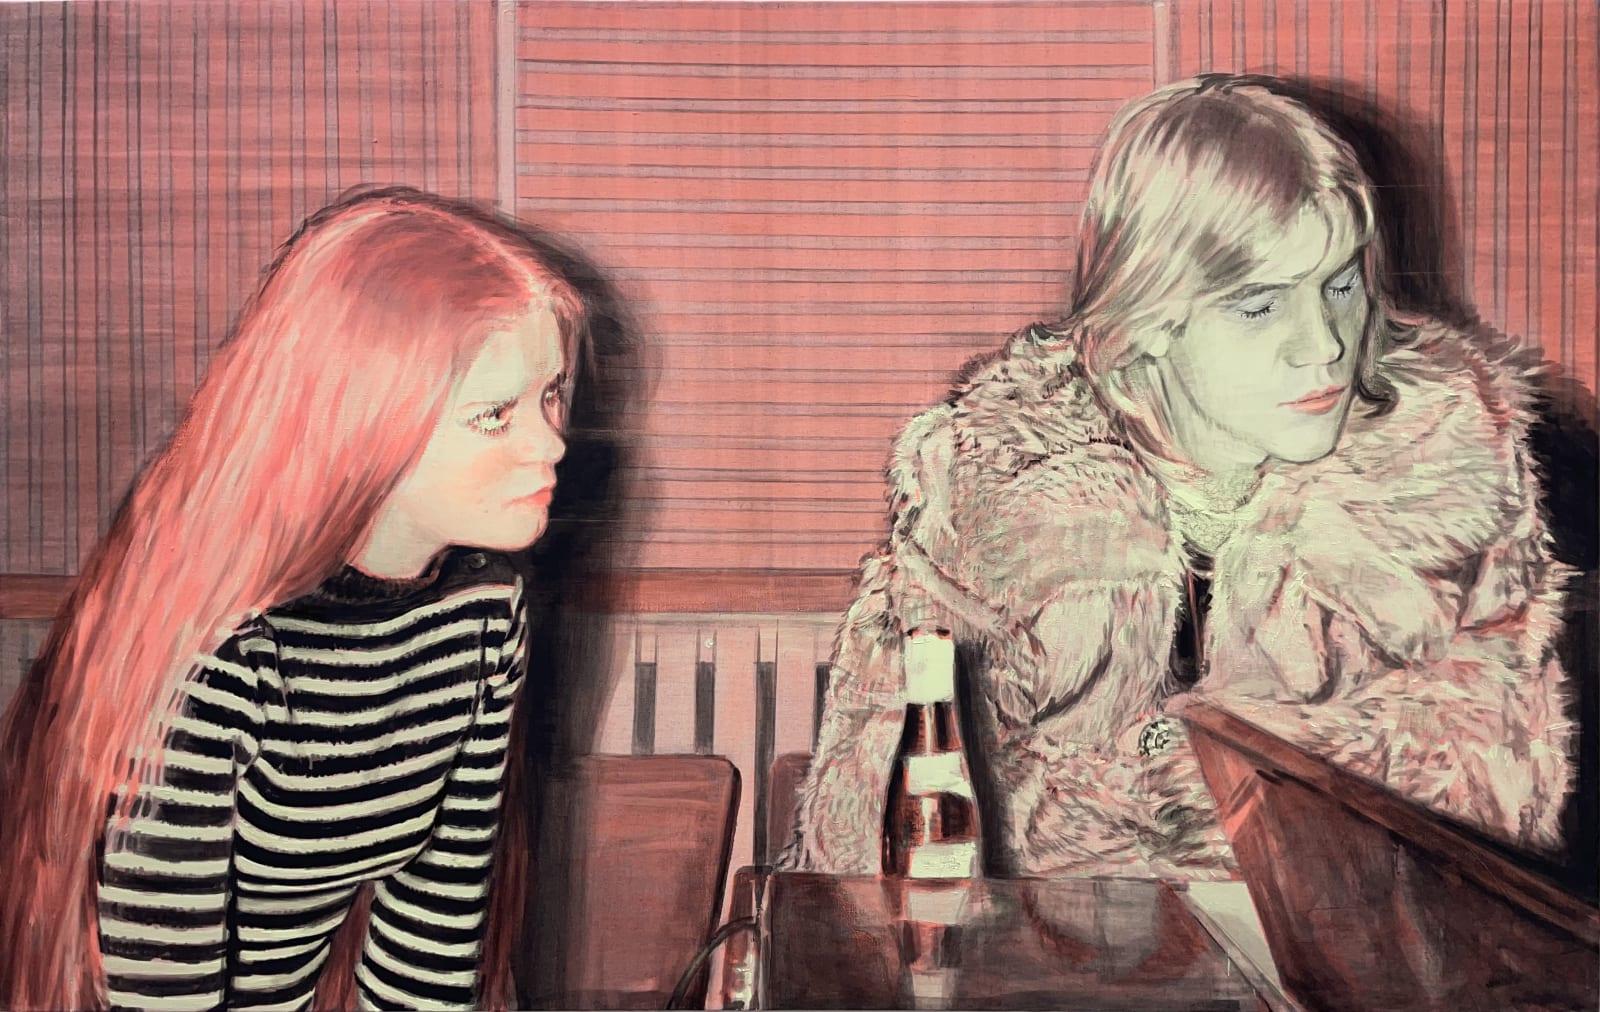 Nina Childress Patrick et la fille rousse, 2021 Phosphorescent pigments, hair, and oil paint on canvas 74 3/4 x 118 1/8 in 190 x 300 cm